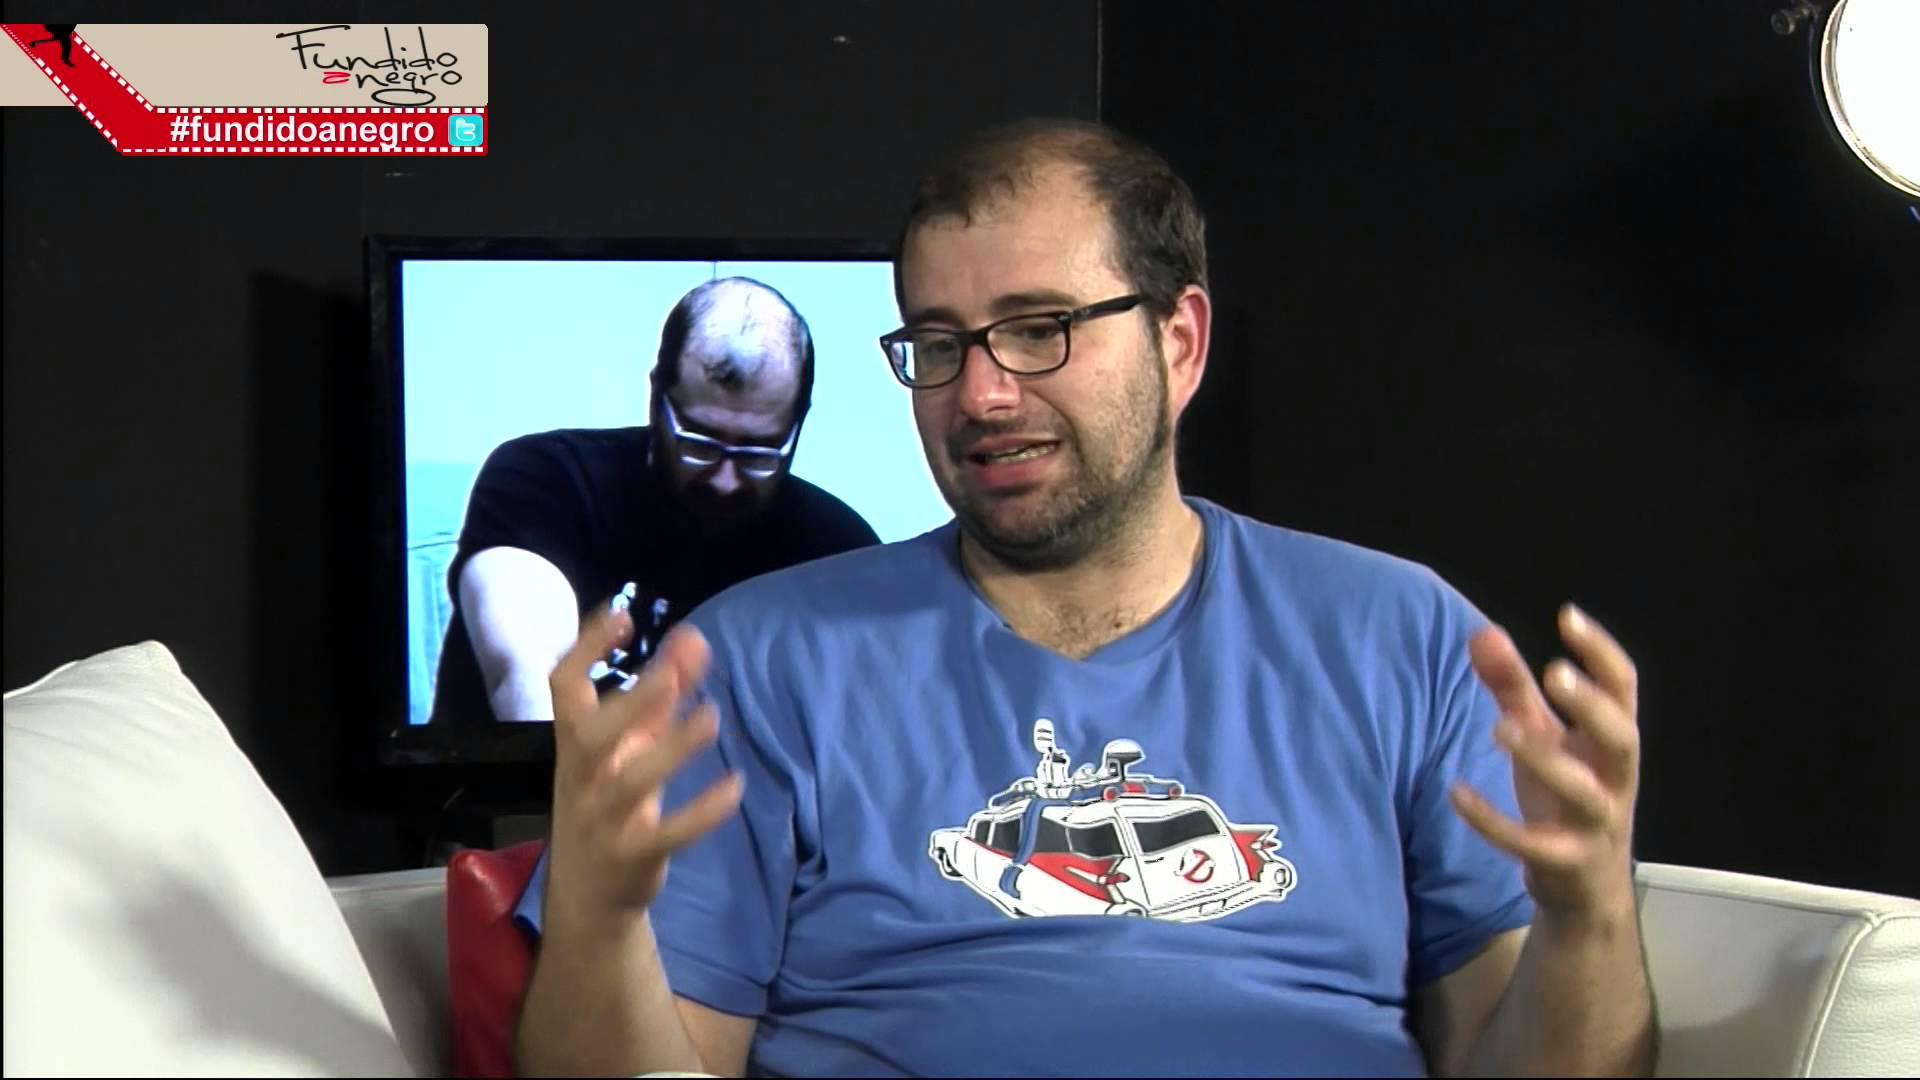 Fundido a Negro entrevista al director Paco Cabezas Parte 2.2